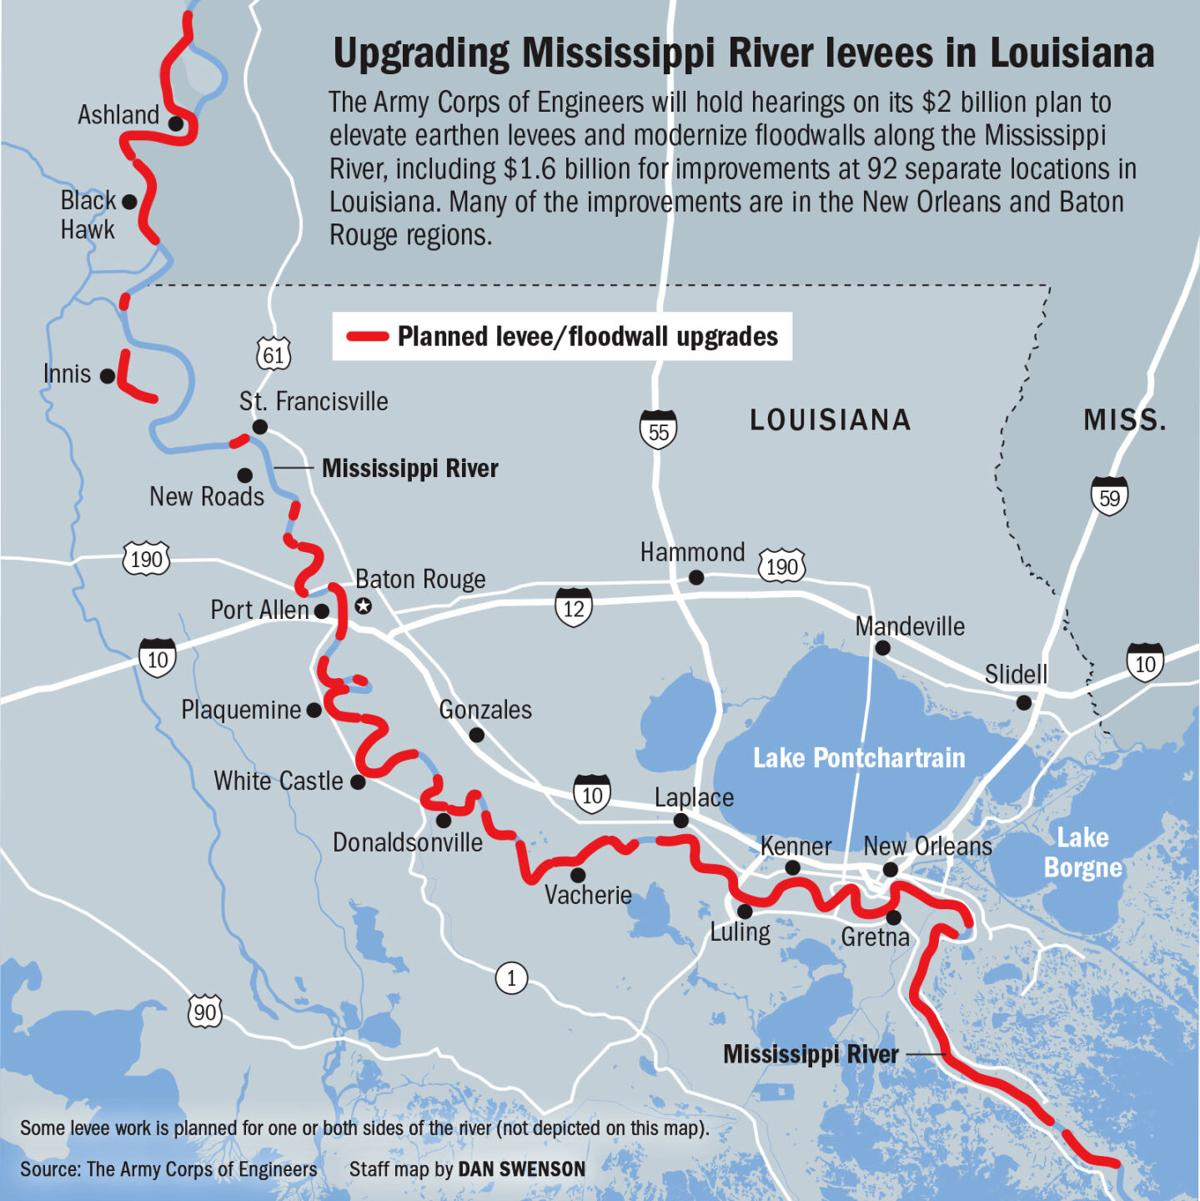 090220 Mississippi River levee work map